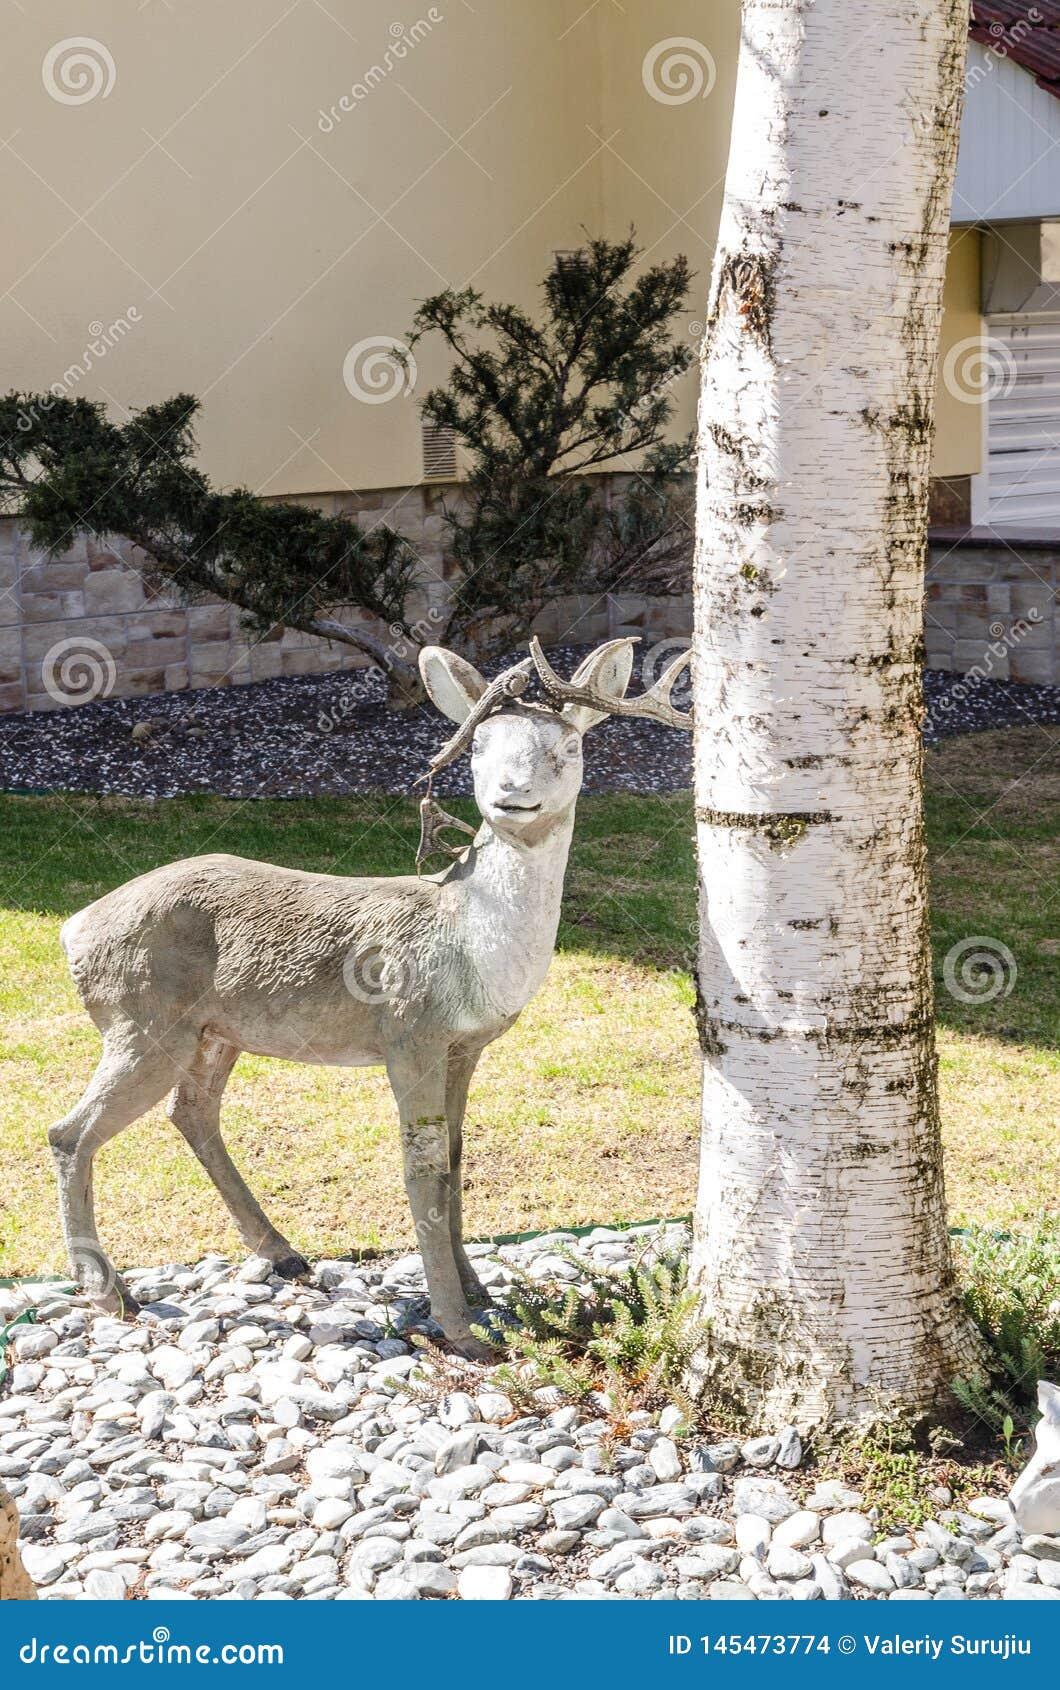 Deer garden decor stock photo. Image of interior, head - 9